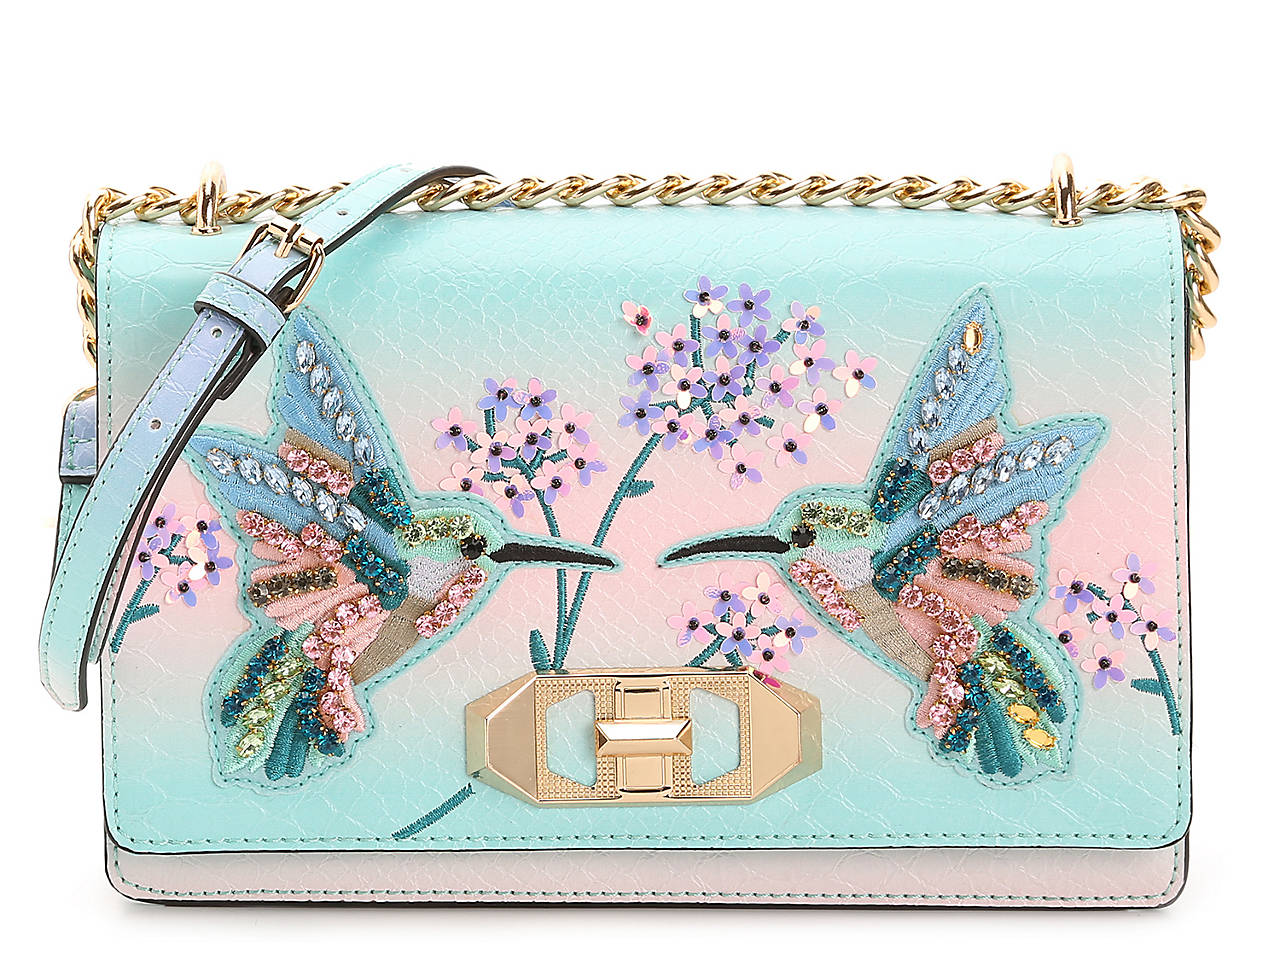 68695d6e410 Aldo Wenang Crossbody Bag Women s Handbags   Accessories